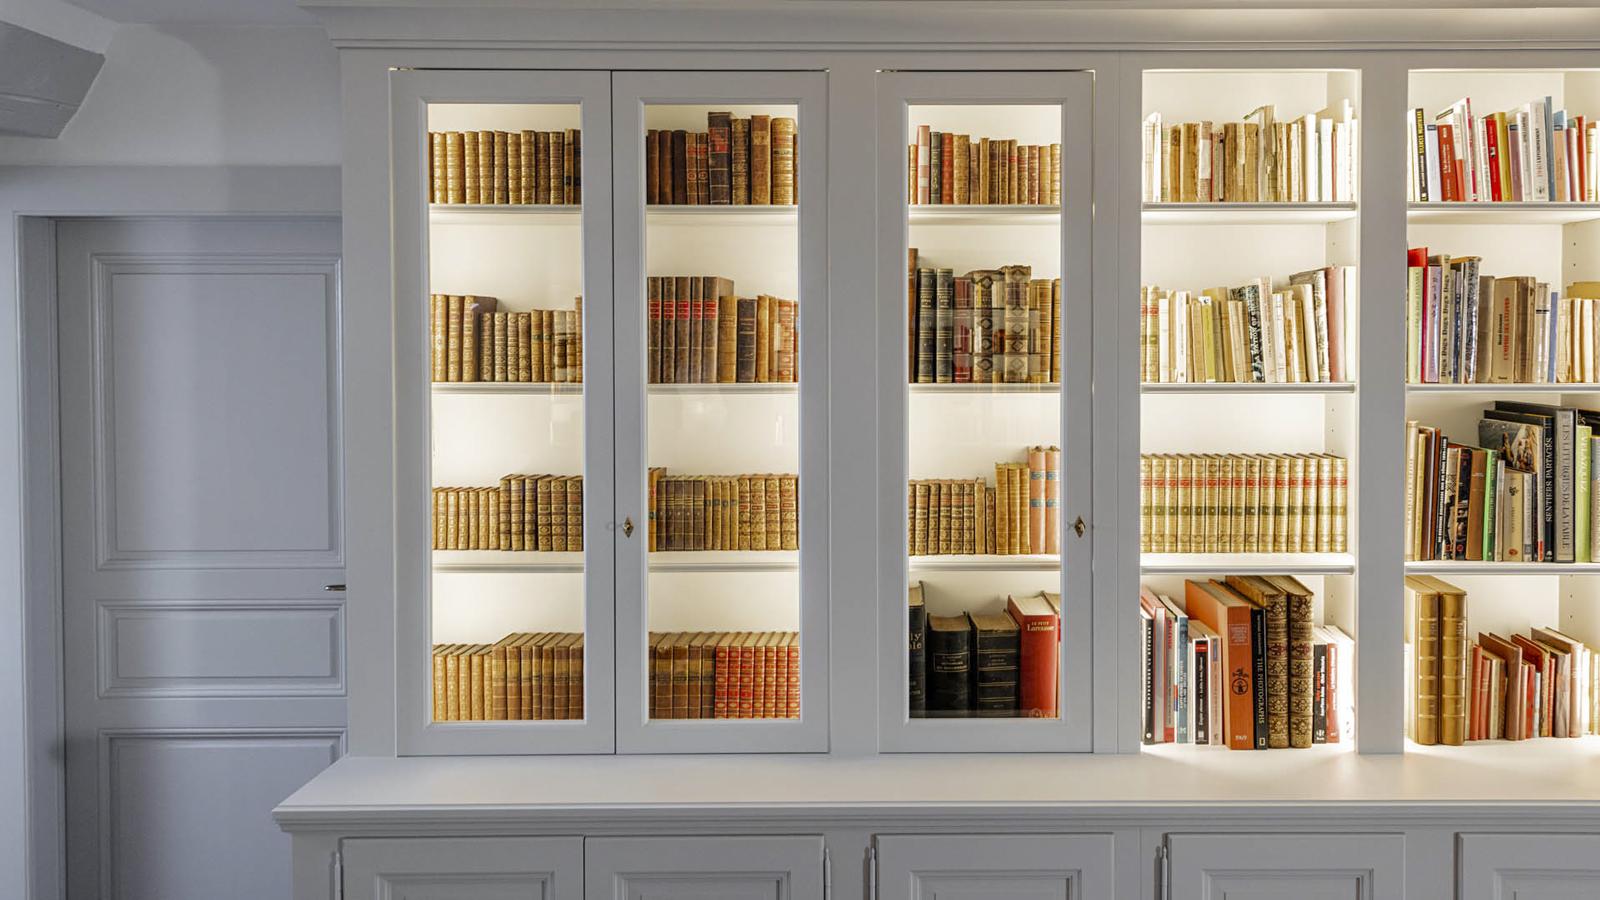 CSDK Architectes Bibliothe%CC%80que Cre%CC%81ation 11 - Custom-made bookcase - Geneva - CSDK Architectes Bibliothe%CC%80que Cre%CC%81ation 11